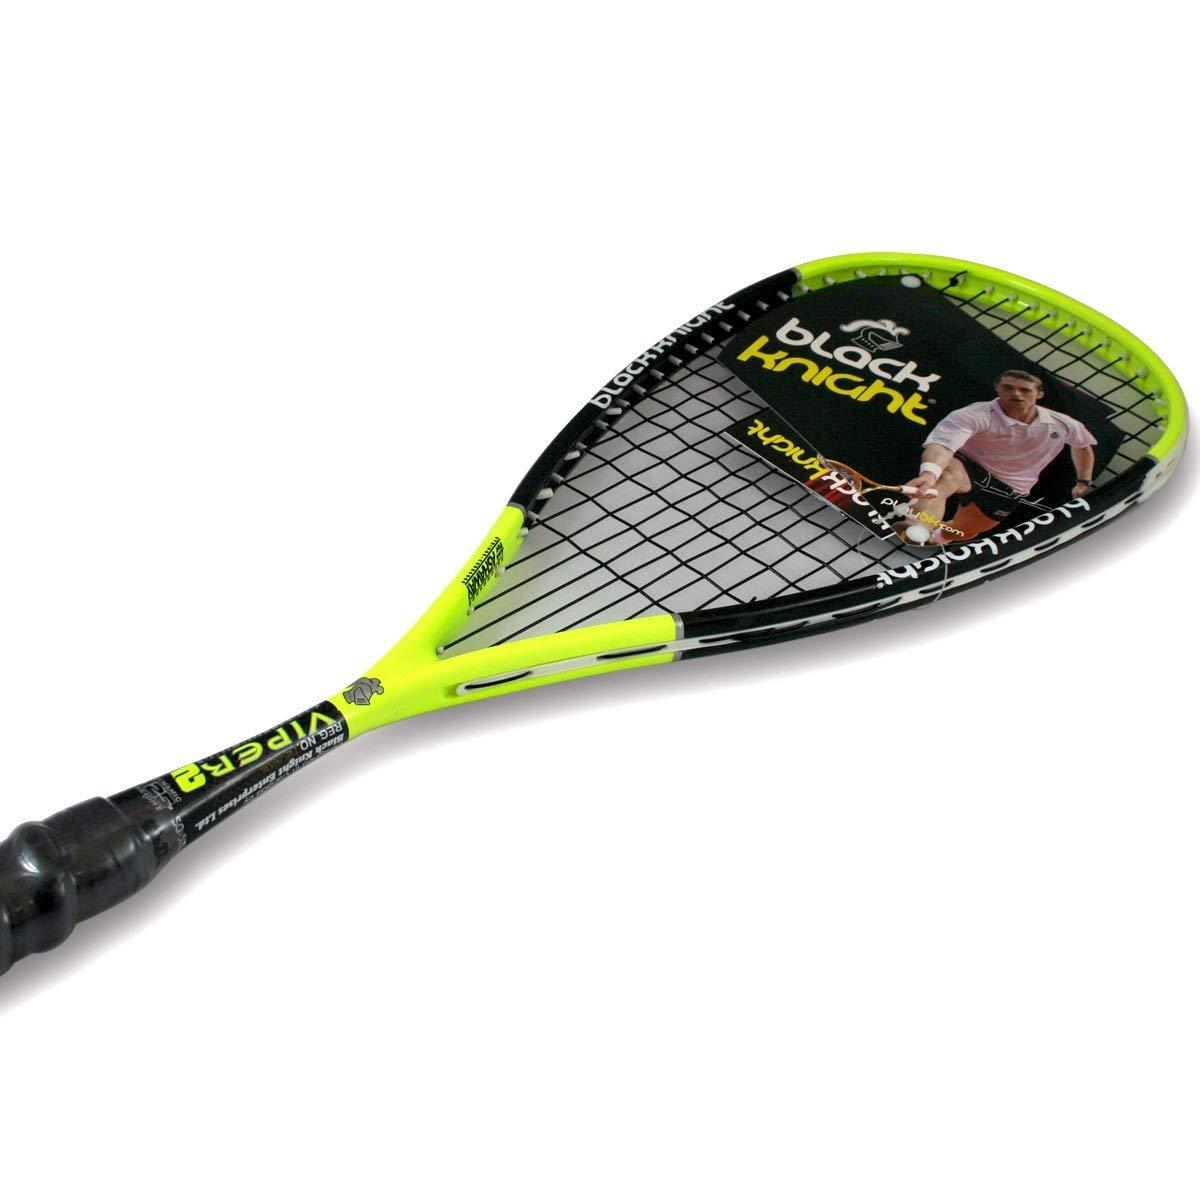 Amazon.com : Black Knight Viper II [Misc.] : Squash Rackets : Sports & Outdoors